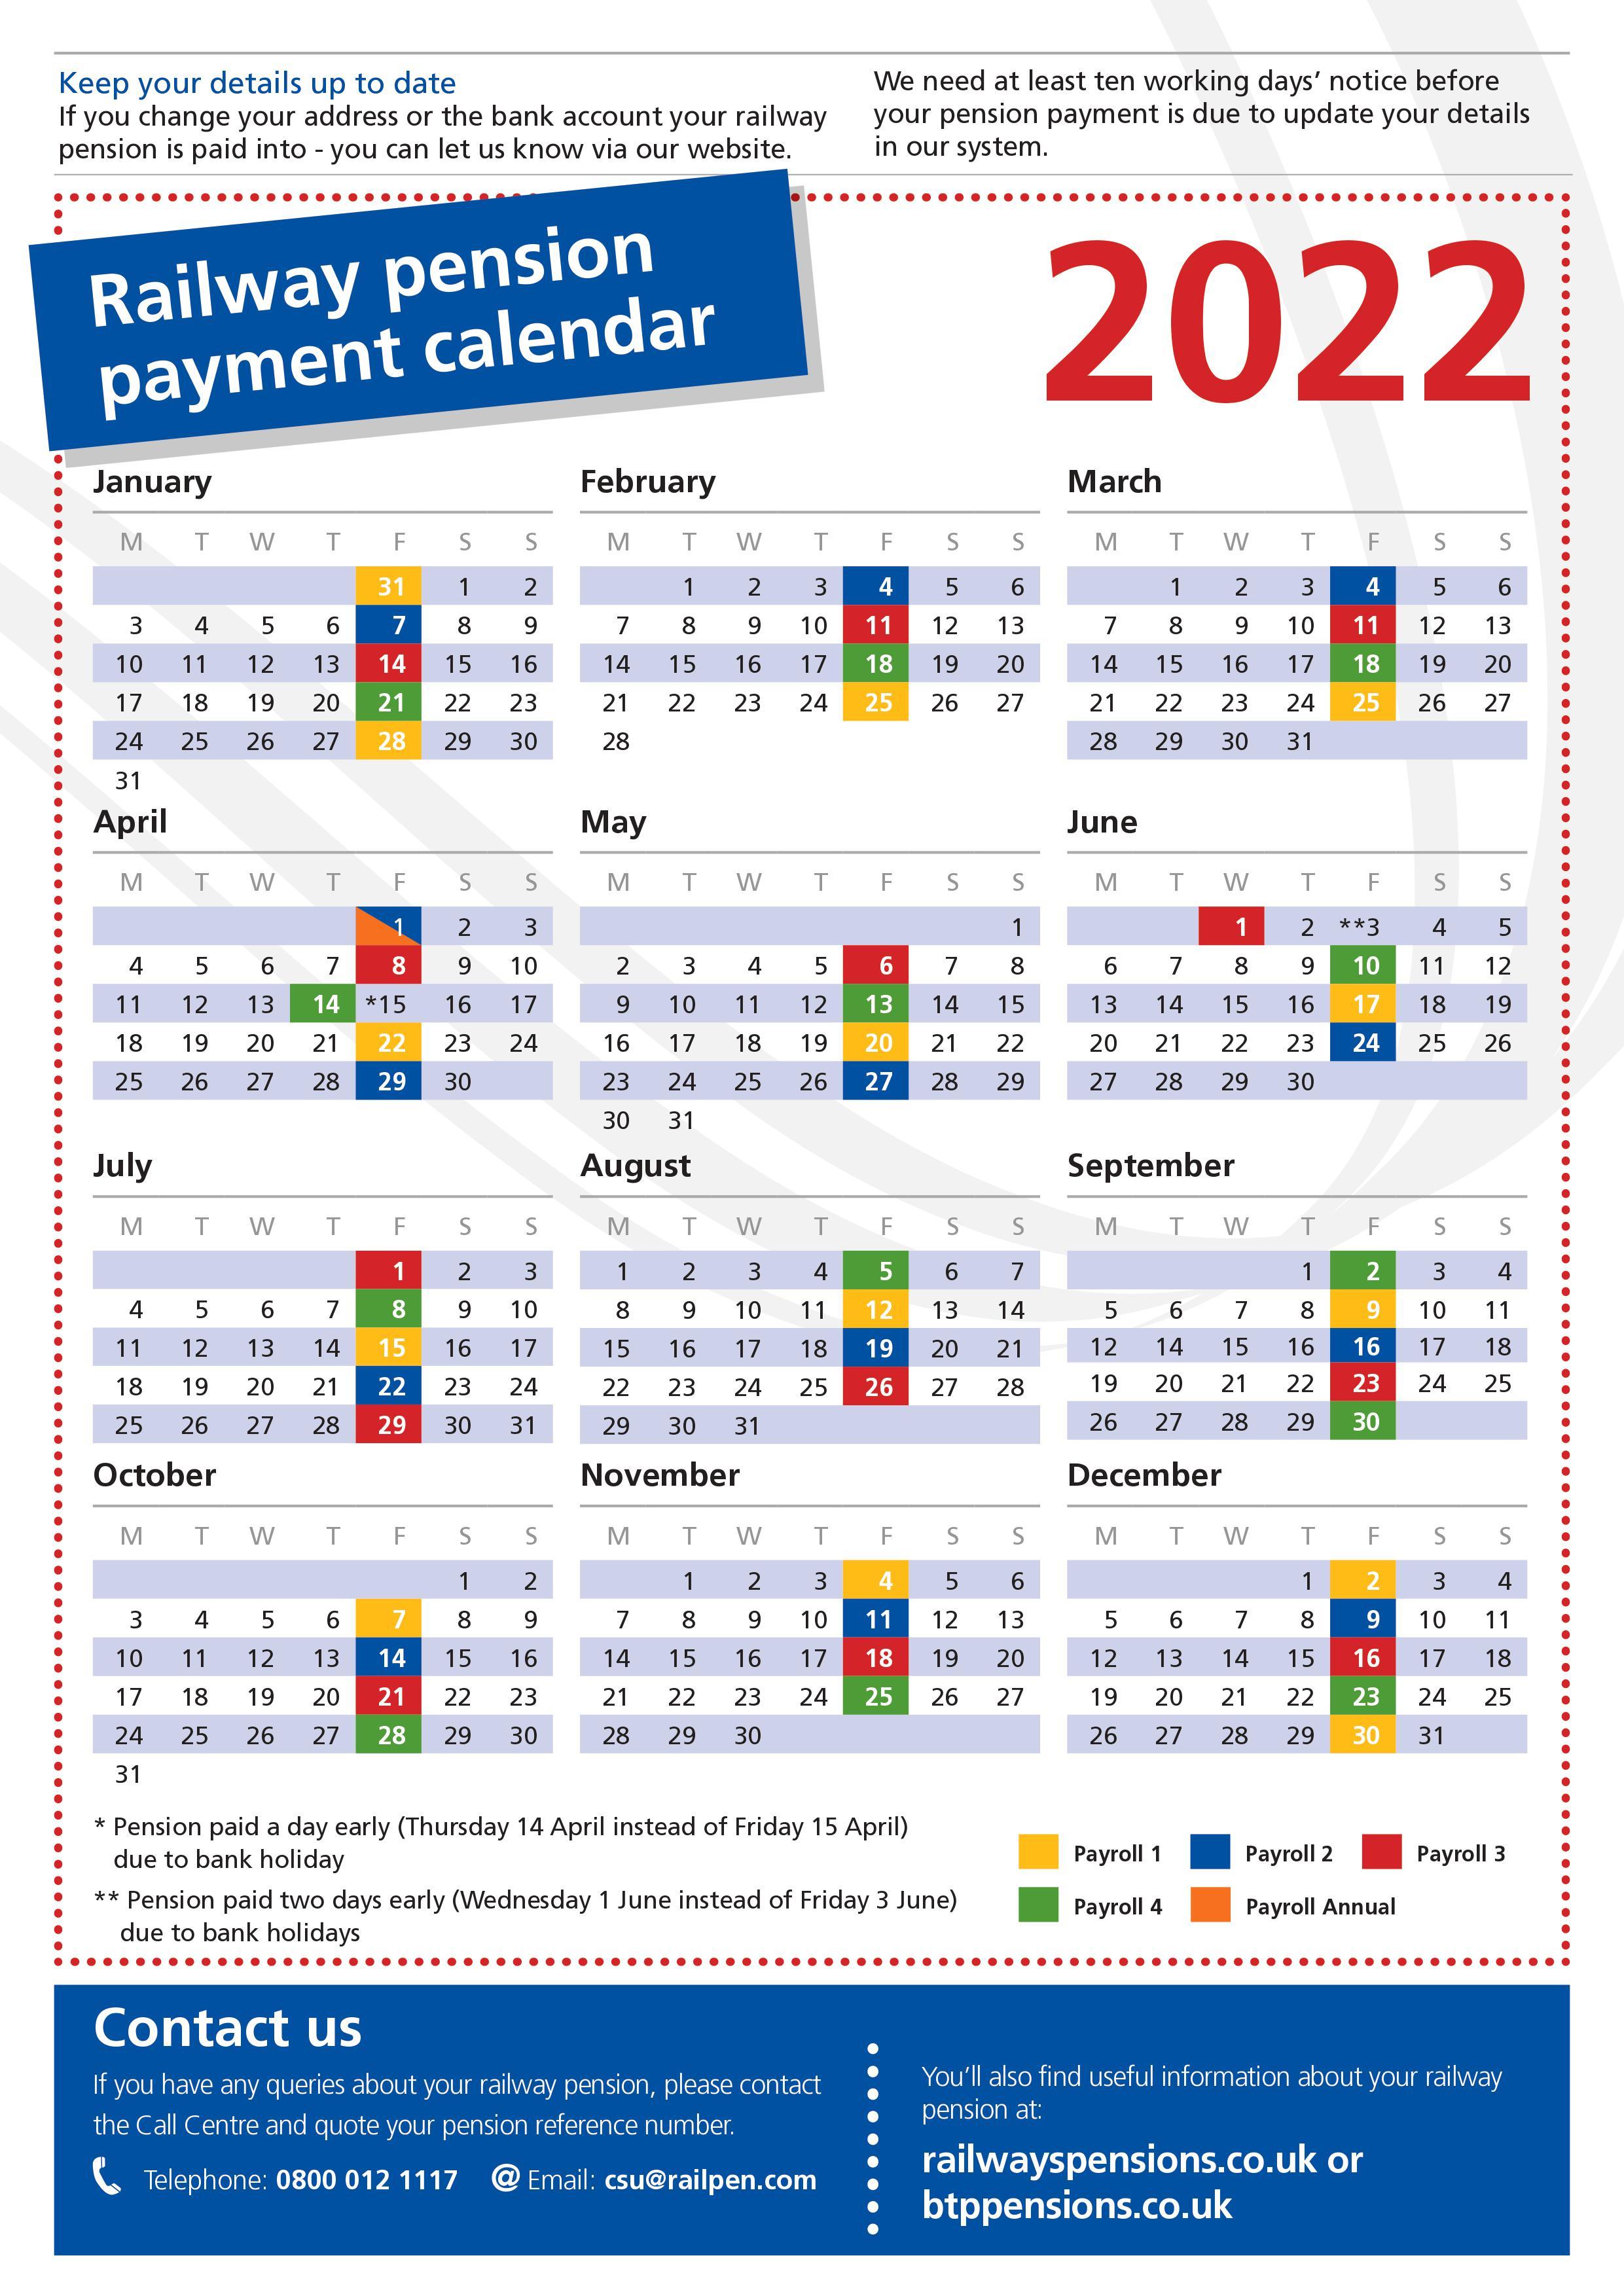 2022 pension payment calendar